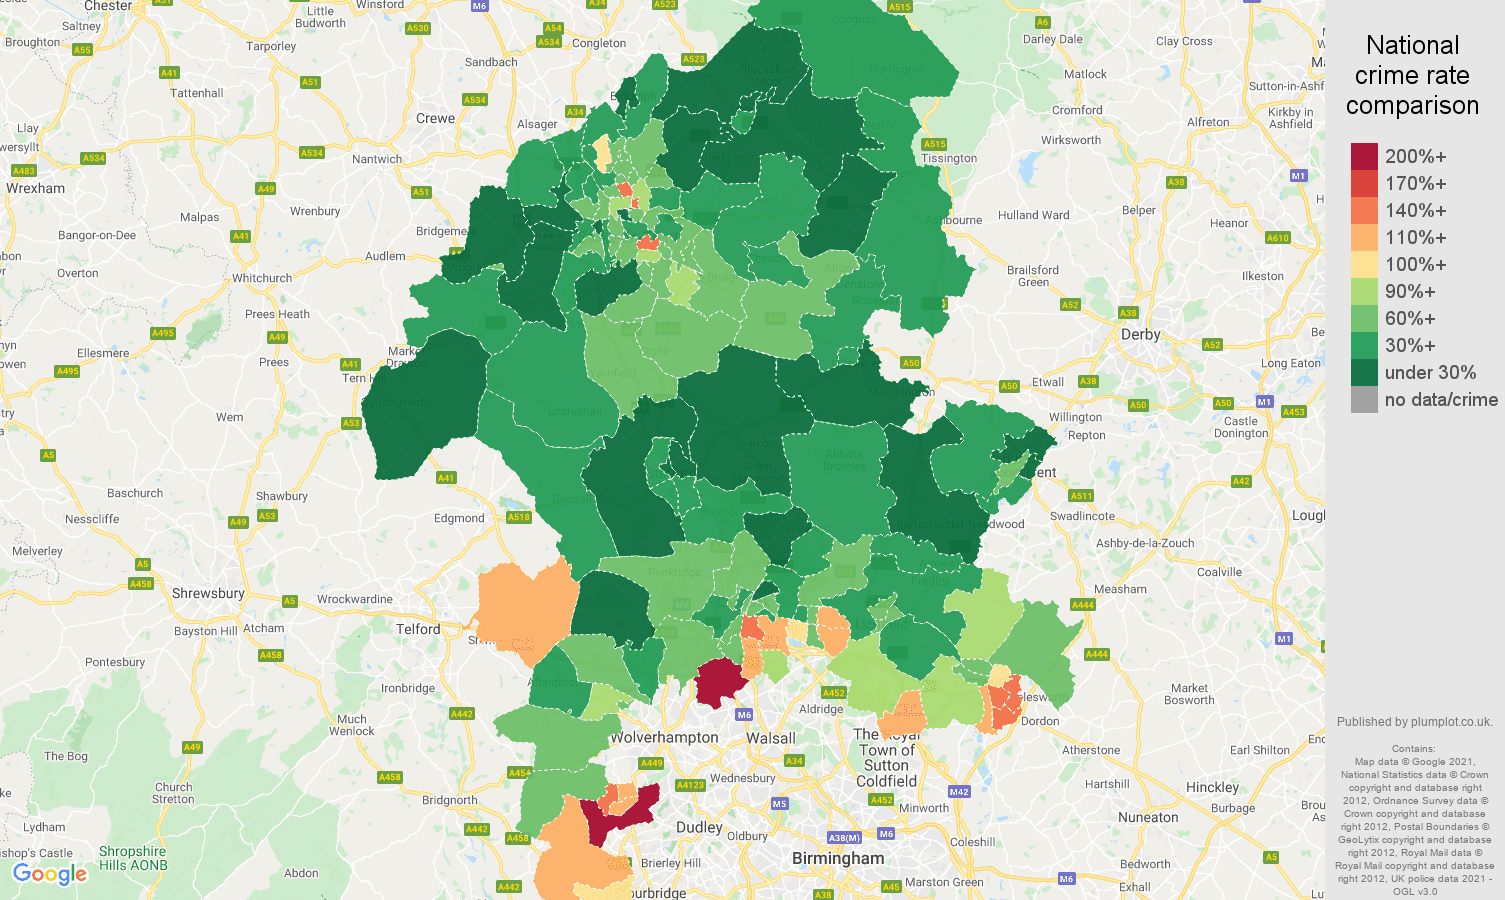 Staffordshire vehicle crime rate comparison map